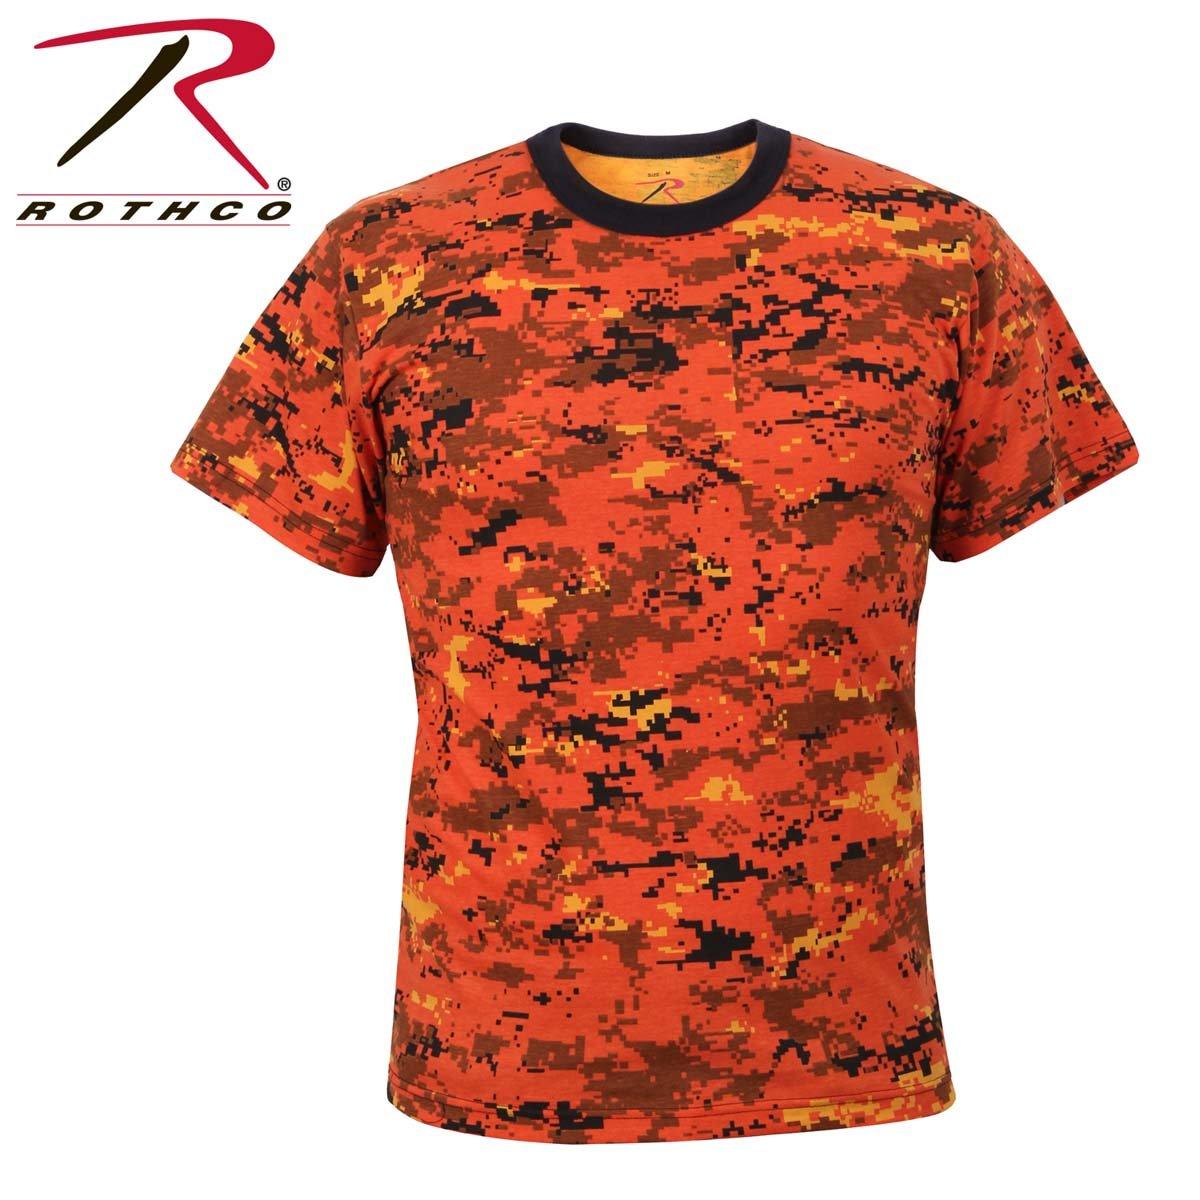 Amazon.com  Rothco Colored Camo T-Shirts  Sports   Outdoors ec05afde15c